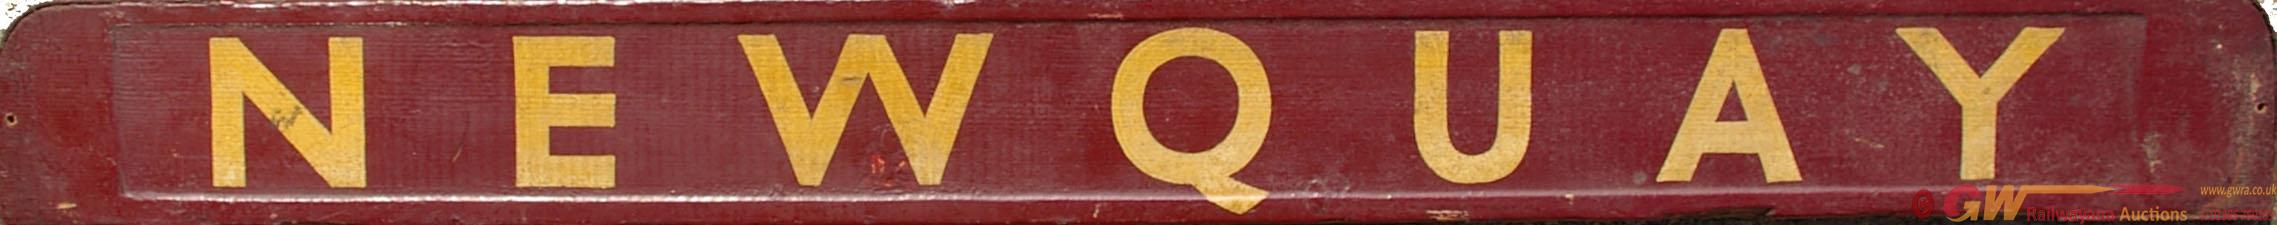 Carriage Board NEWQUAY - PAR. Wooden Construction